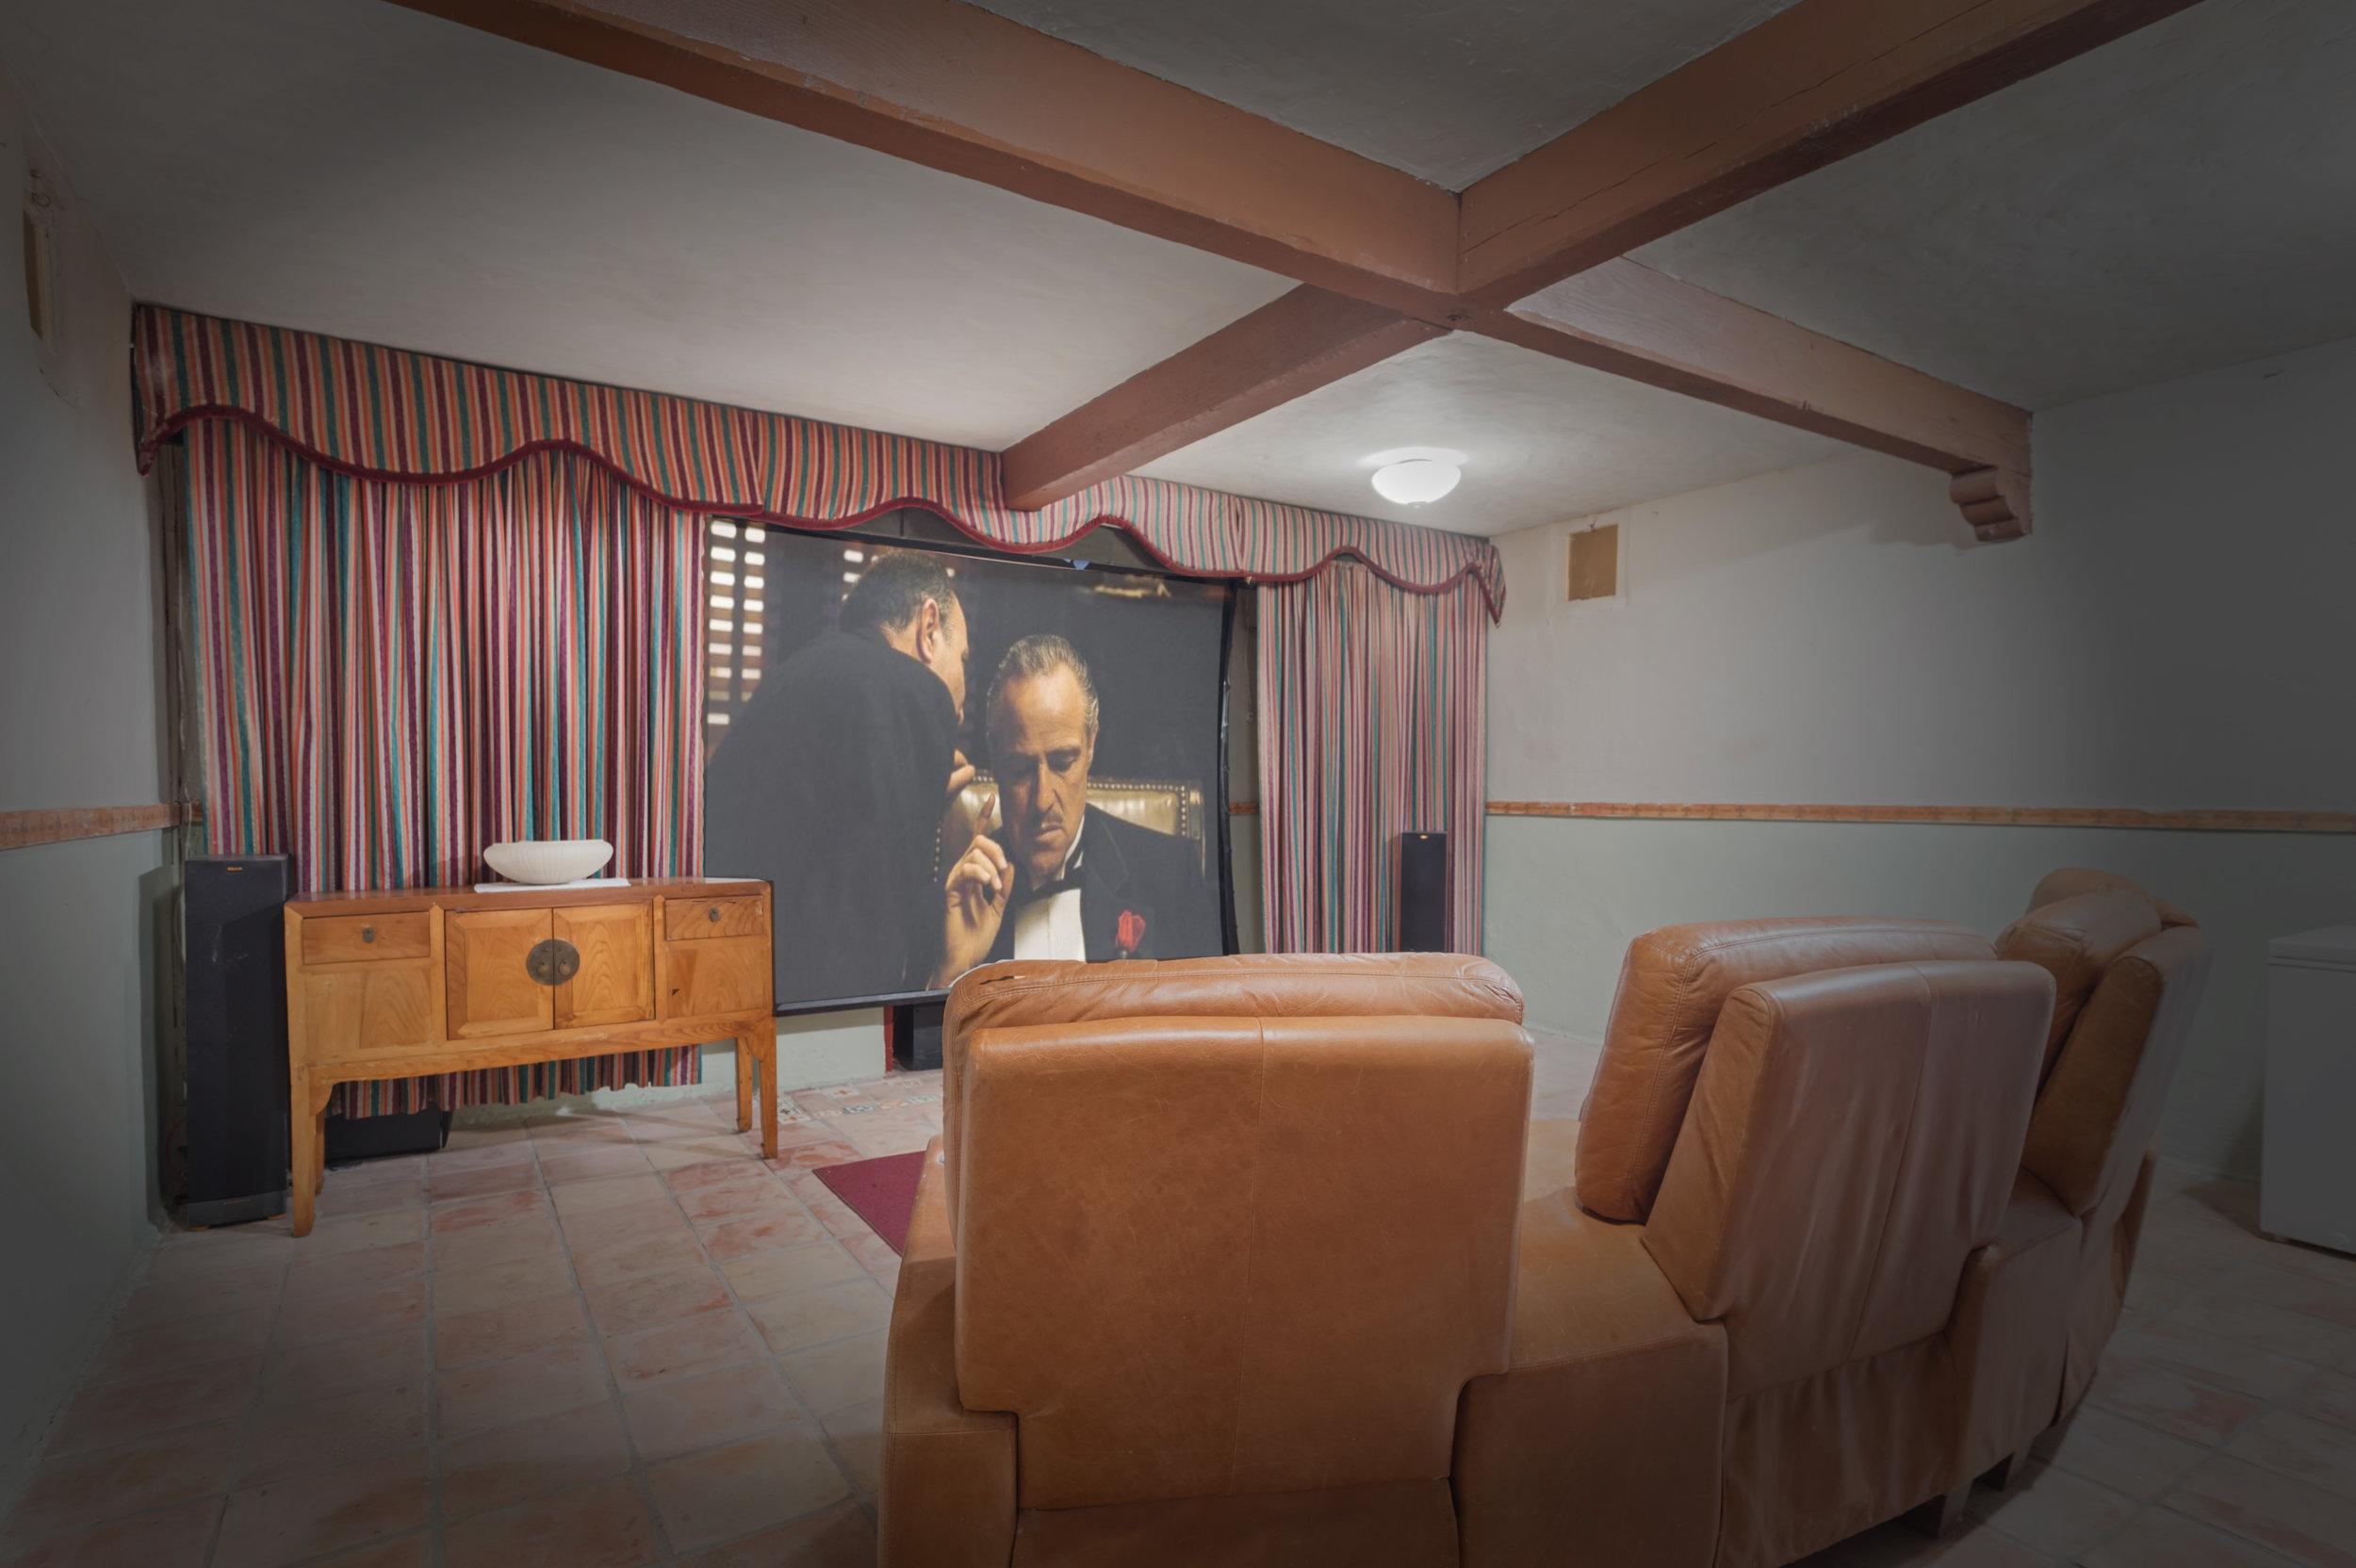 023.3 Theatre 006 Pool 4915 Los Feliz For Sale Los Angeles Lease The Malibu Life Team Luxury Real Estate.jpg